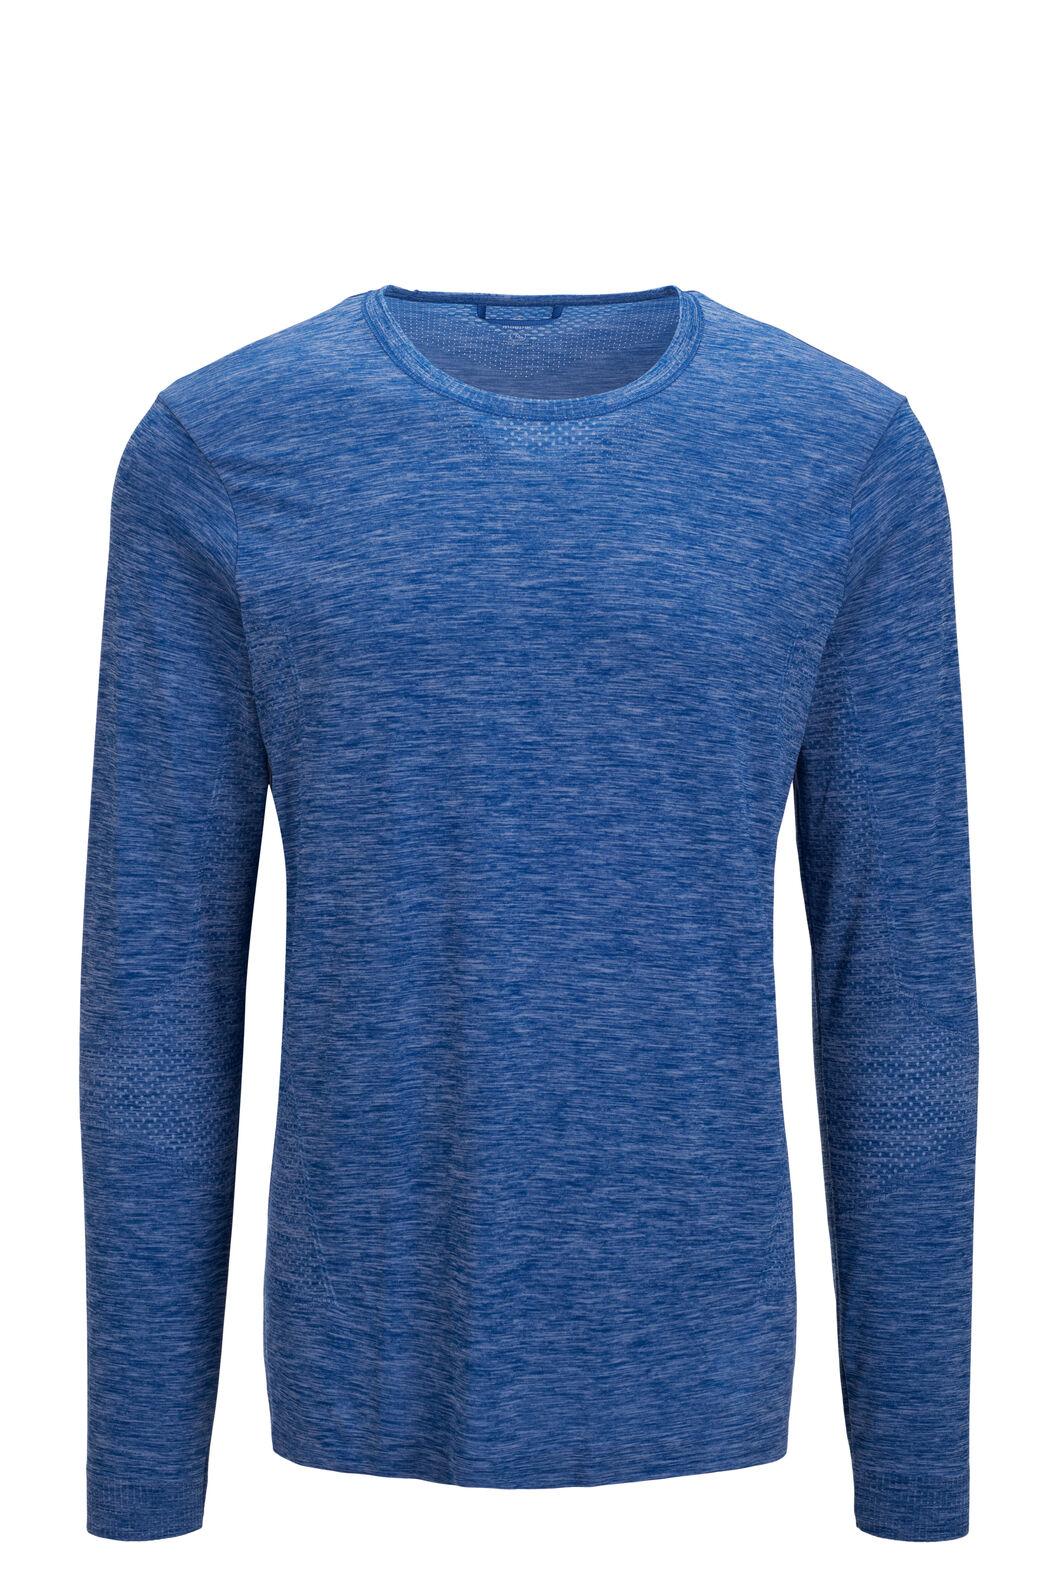 Macpac Men's Limitless Long Sleeve Tee, Classic Blue, hi-res